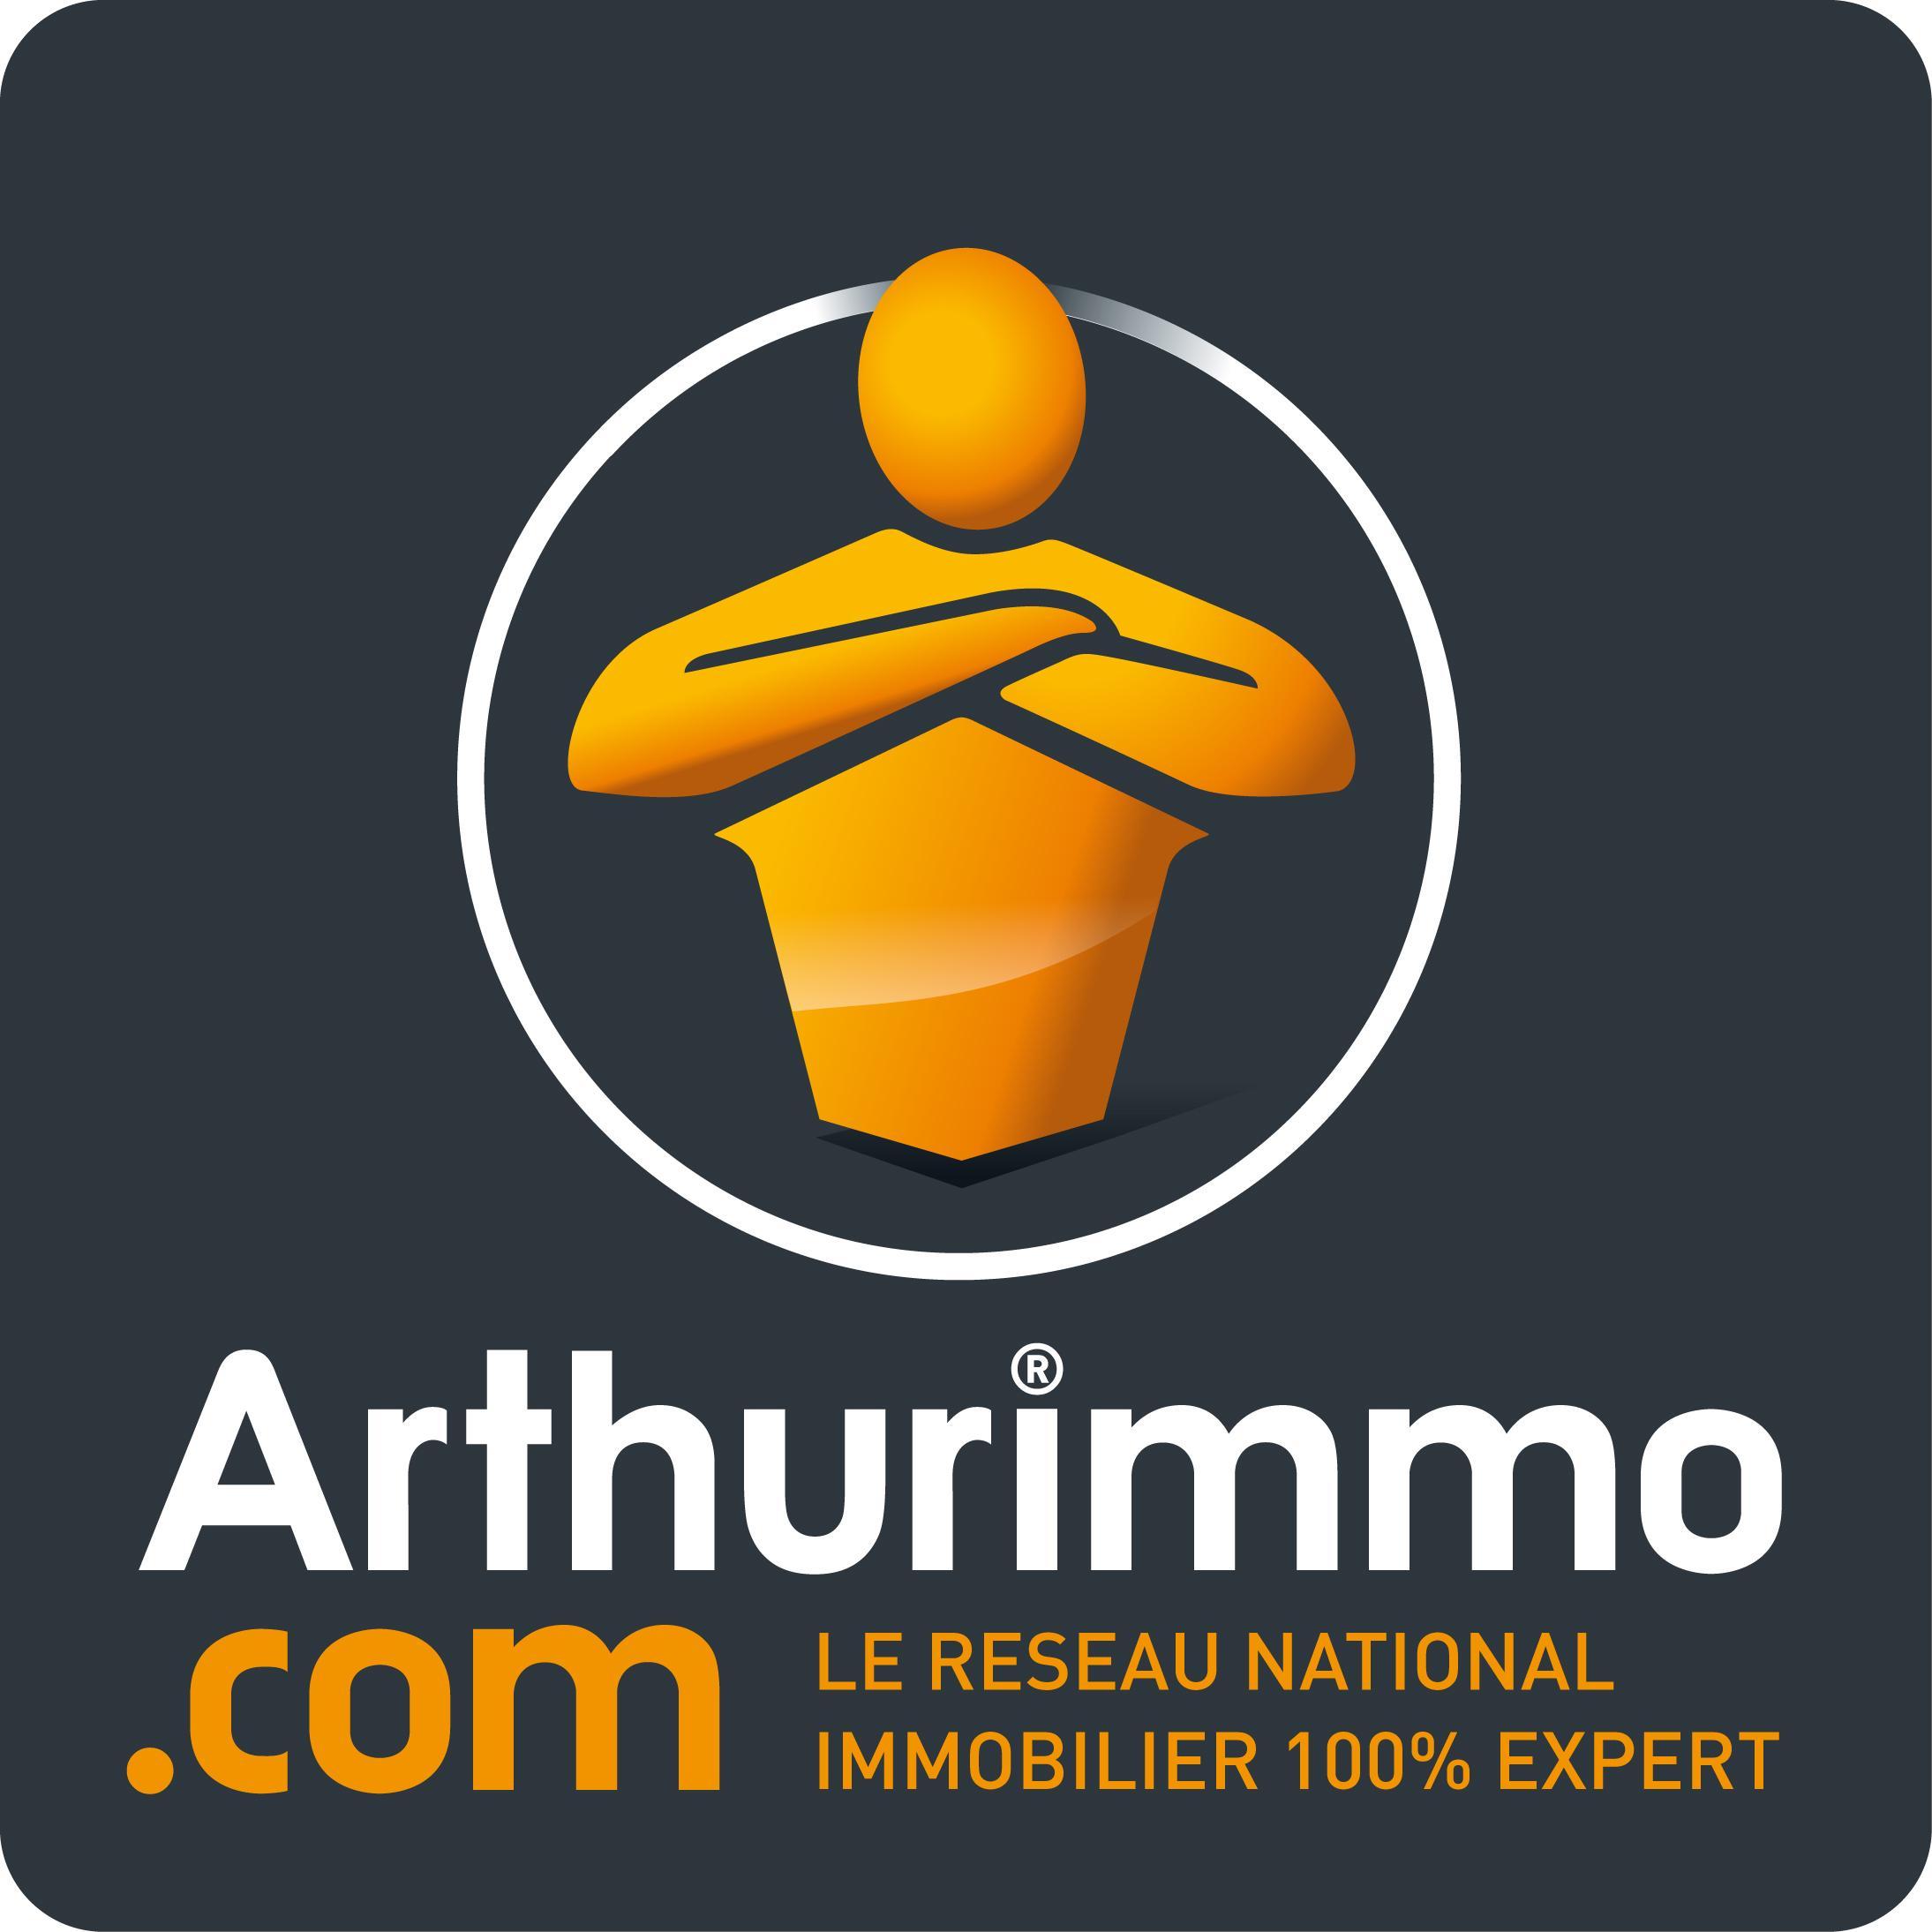 Arthurimmo.com Thonon-les-Bains agence immobilière Thonon-les-Bains (74200)